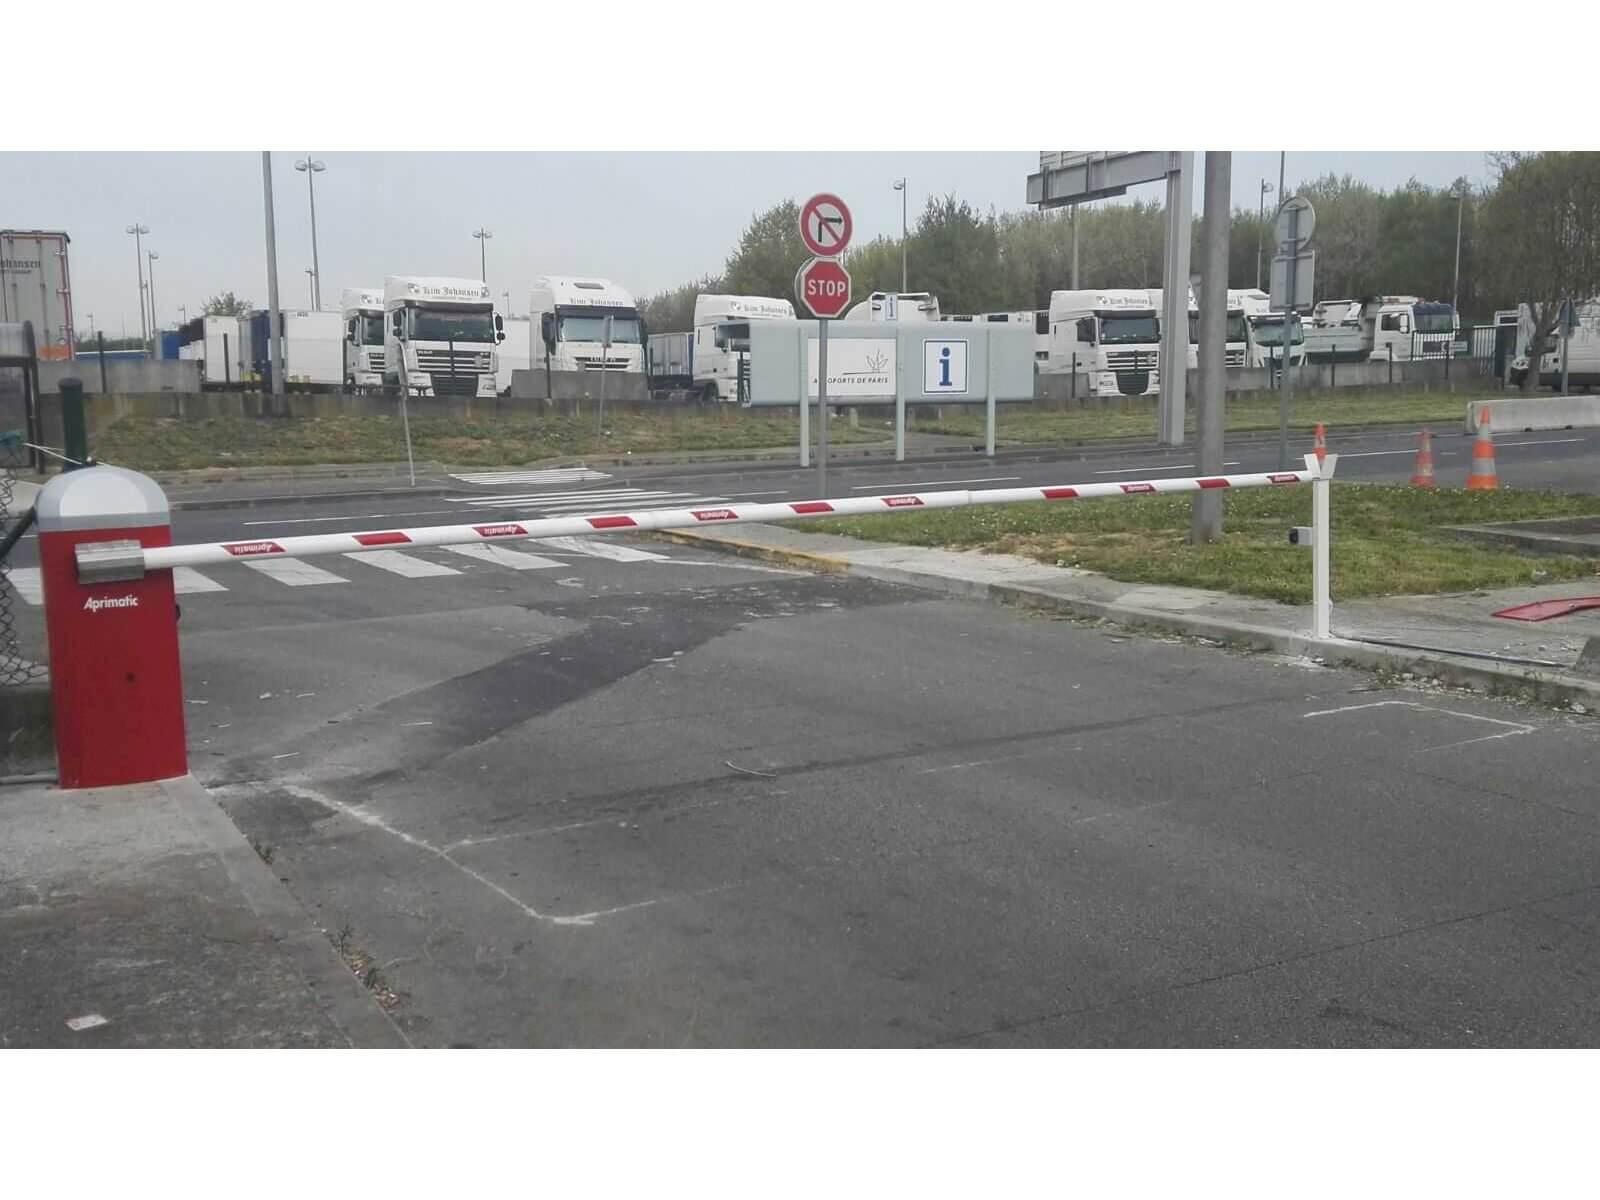 barrera parking aeropuerto charles degaul